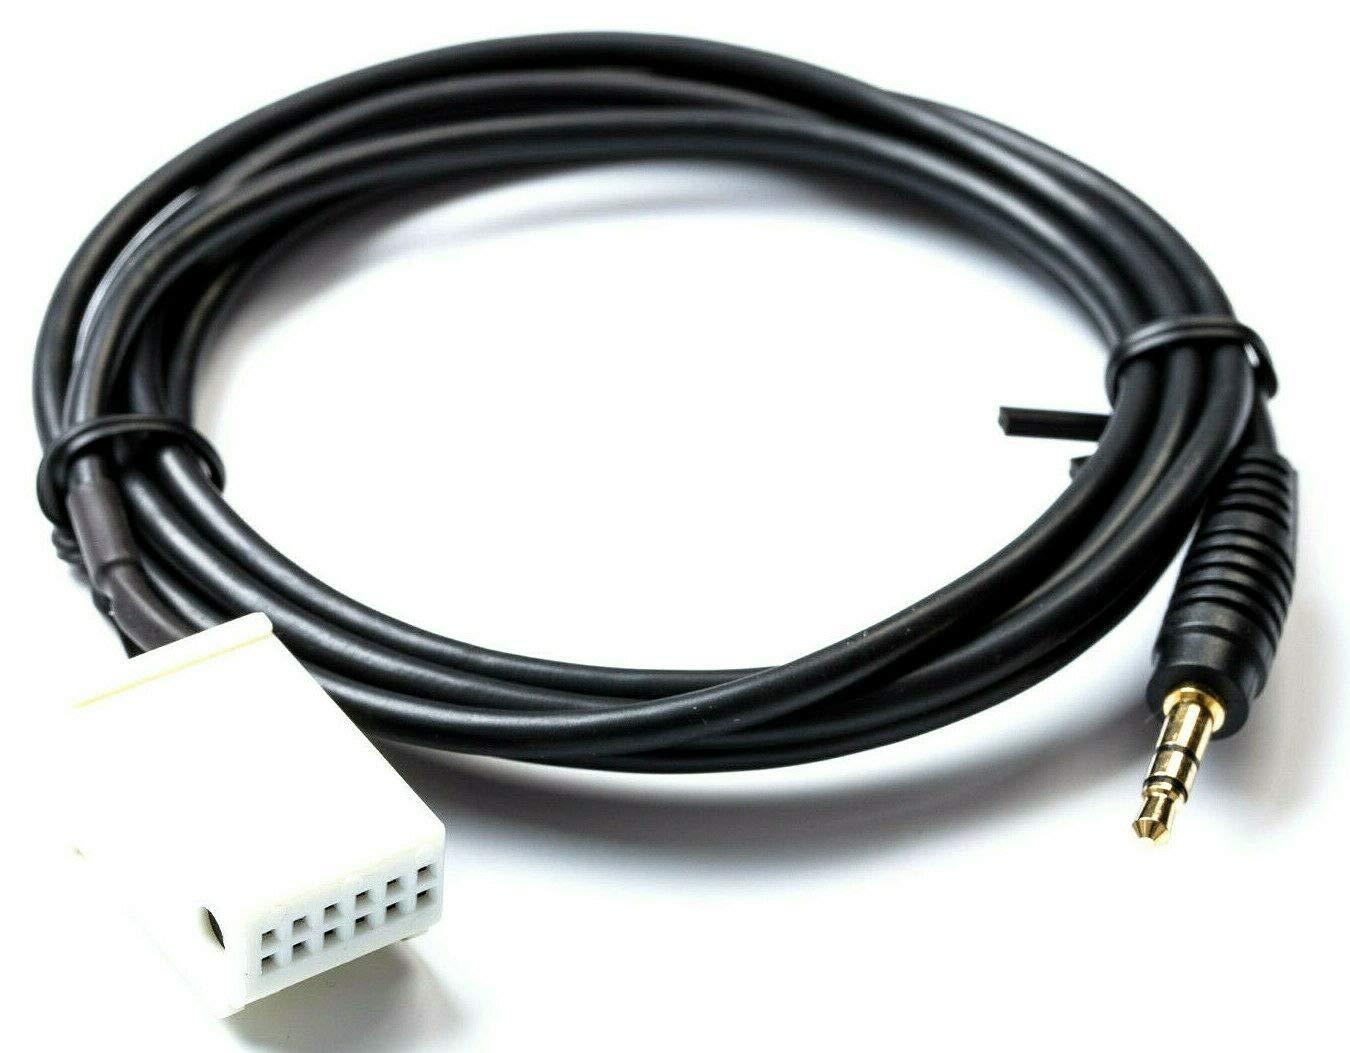 Adaptador AUX Compatible con Mercedes Comand APS NTG 2 Audio 20 50 MF2540 Cable MP3